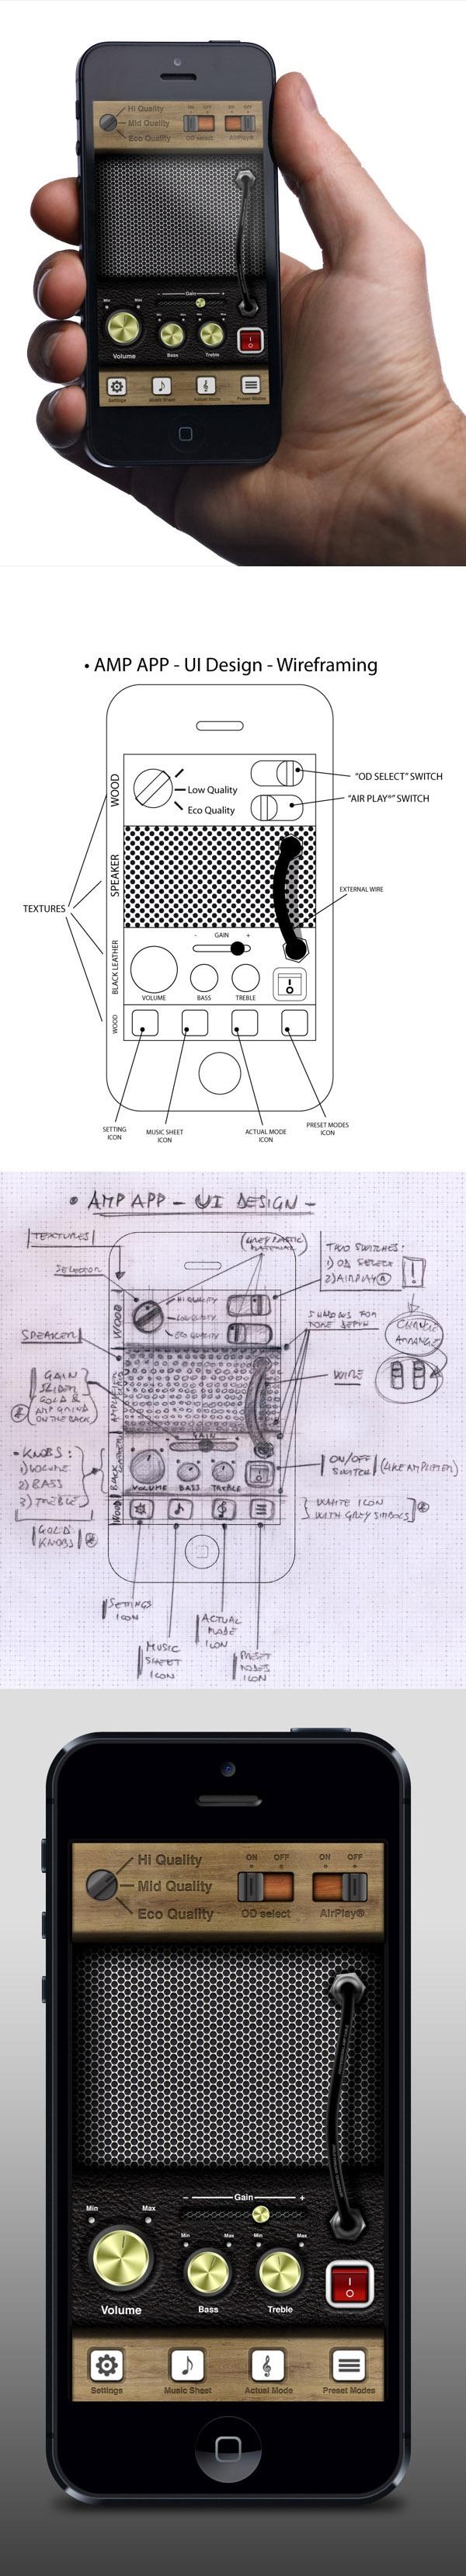 • iPhone UI Case Study - Amplifier App • by Tobia Crivellari, via Behance